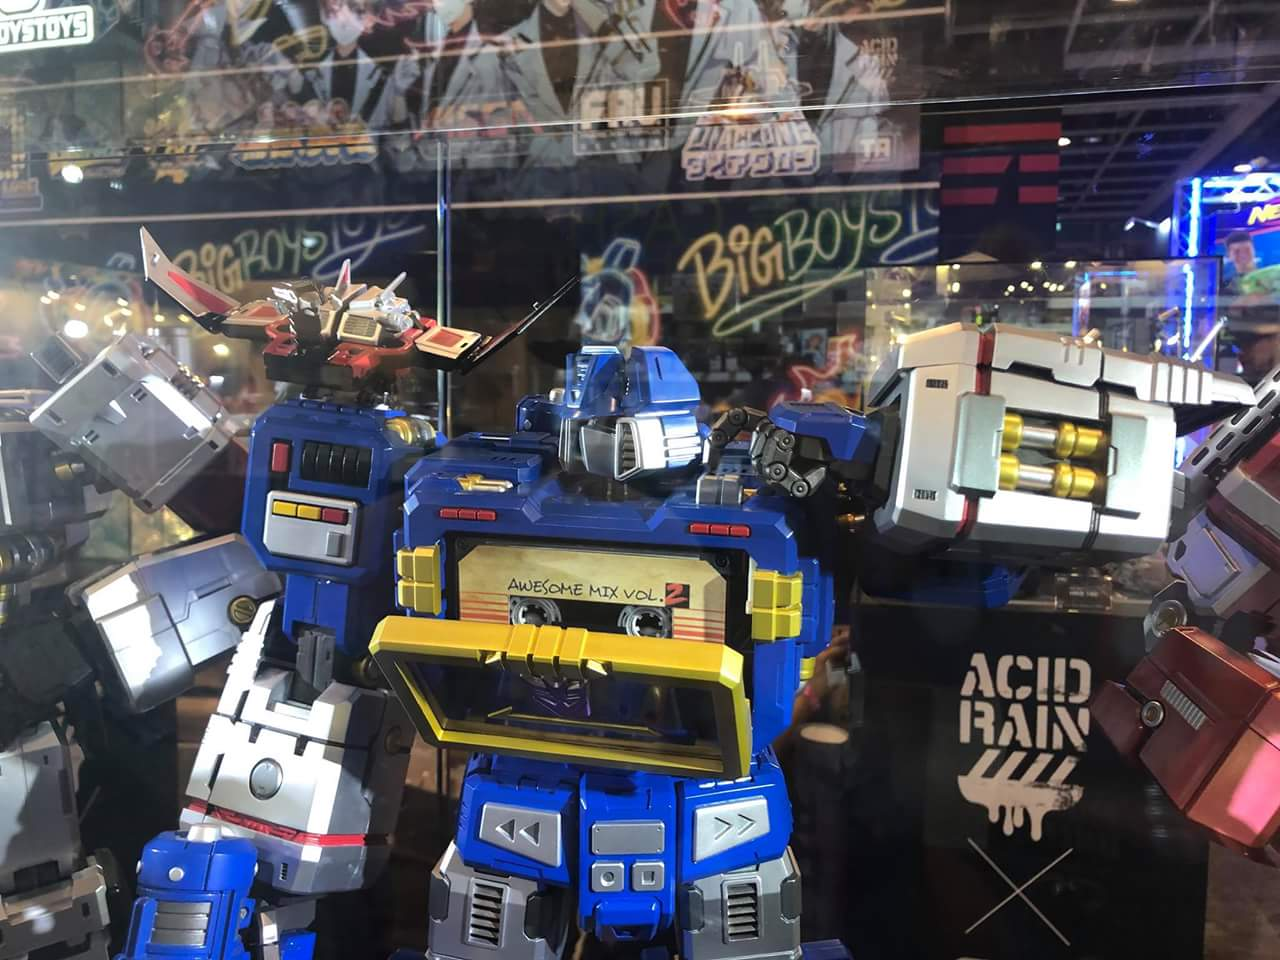 Figurines Transformers G1 (articulé, non transformable) ― Par 3A, Action Toys, Fewture, Toys Alliance, Sentinel, Kotobukiya, Kids Logic, Herocross, EX Gokin, etc - Page 6 A6e8wEtp_o